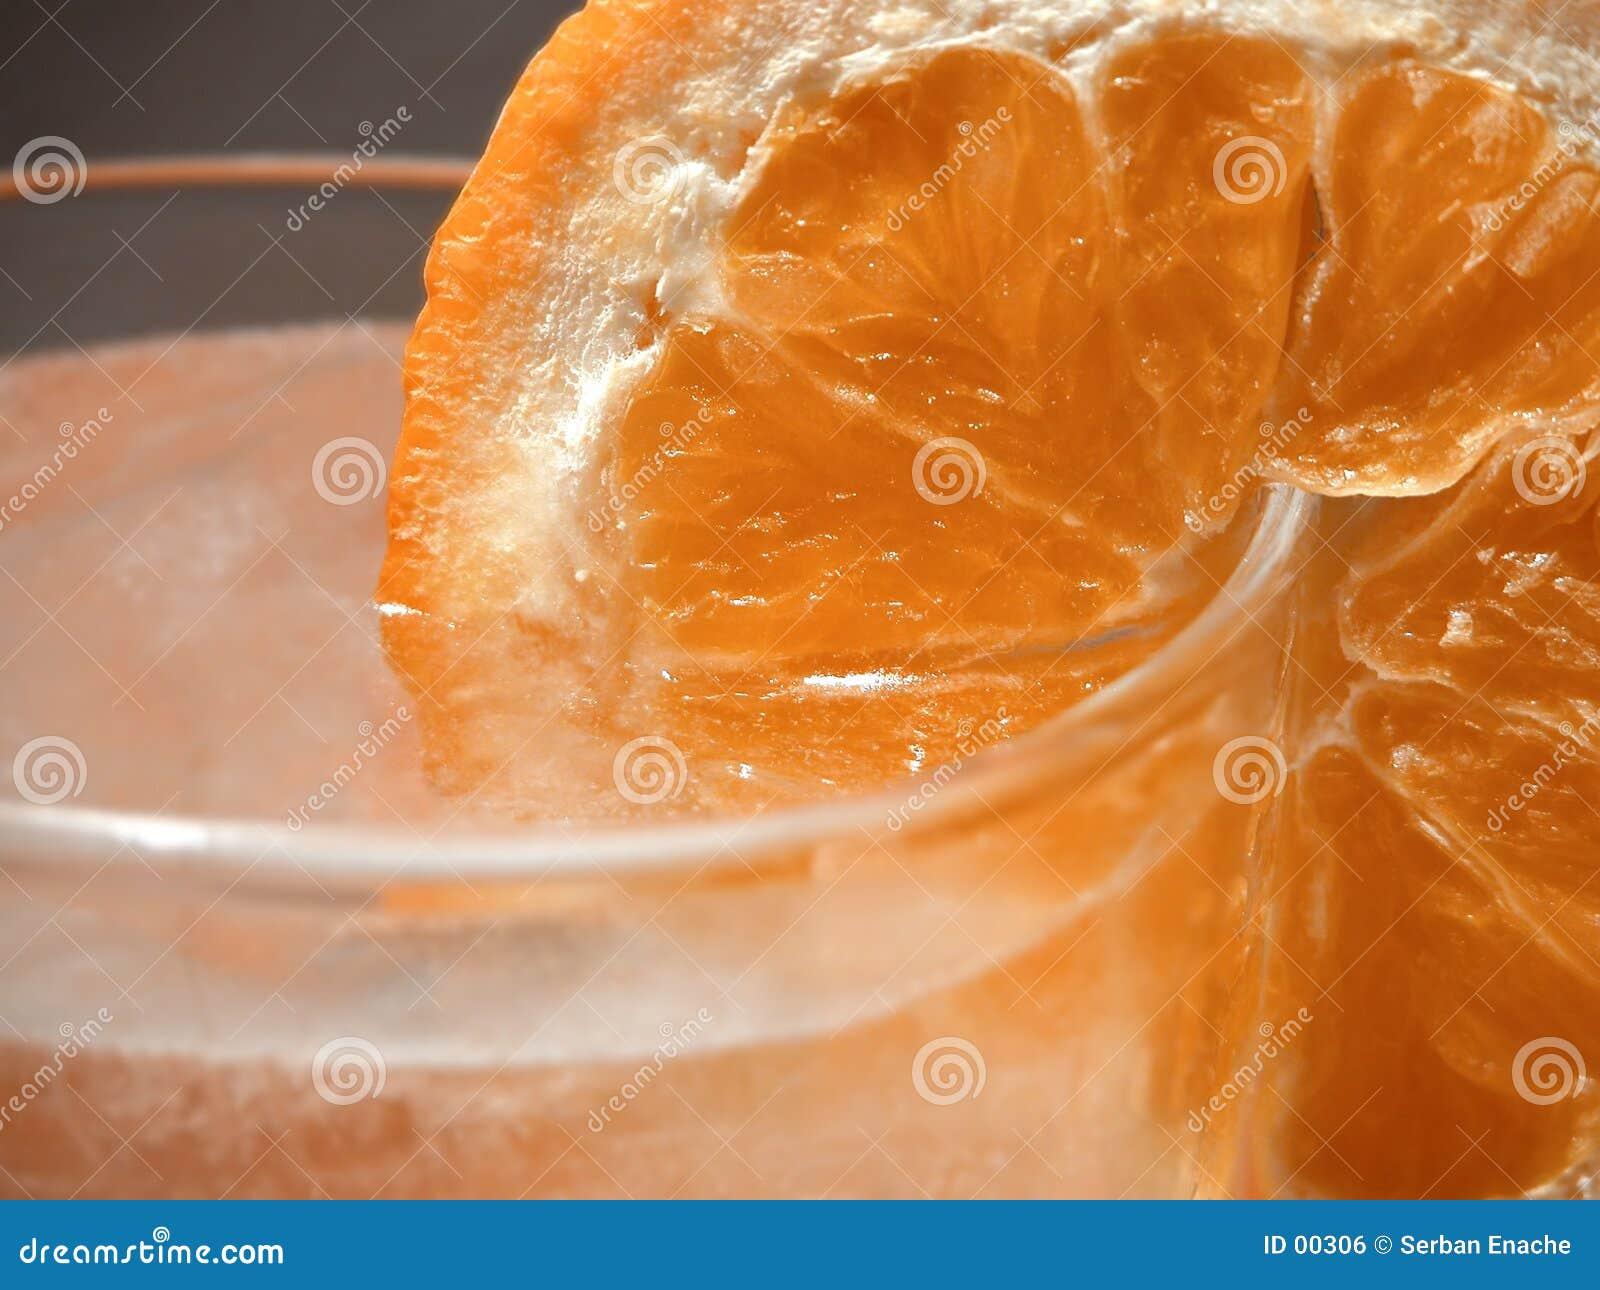 Oranje plak - detail